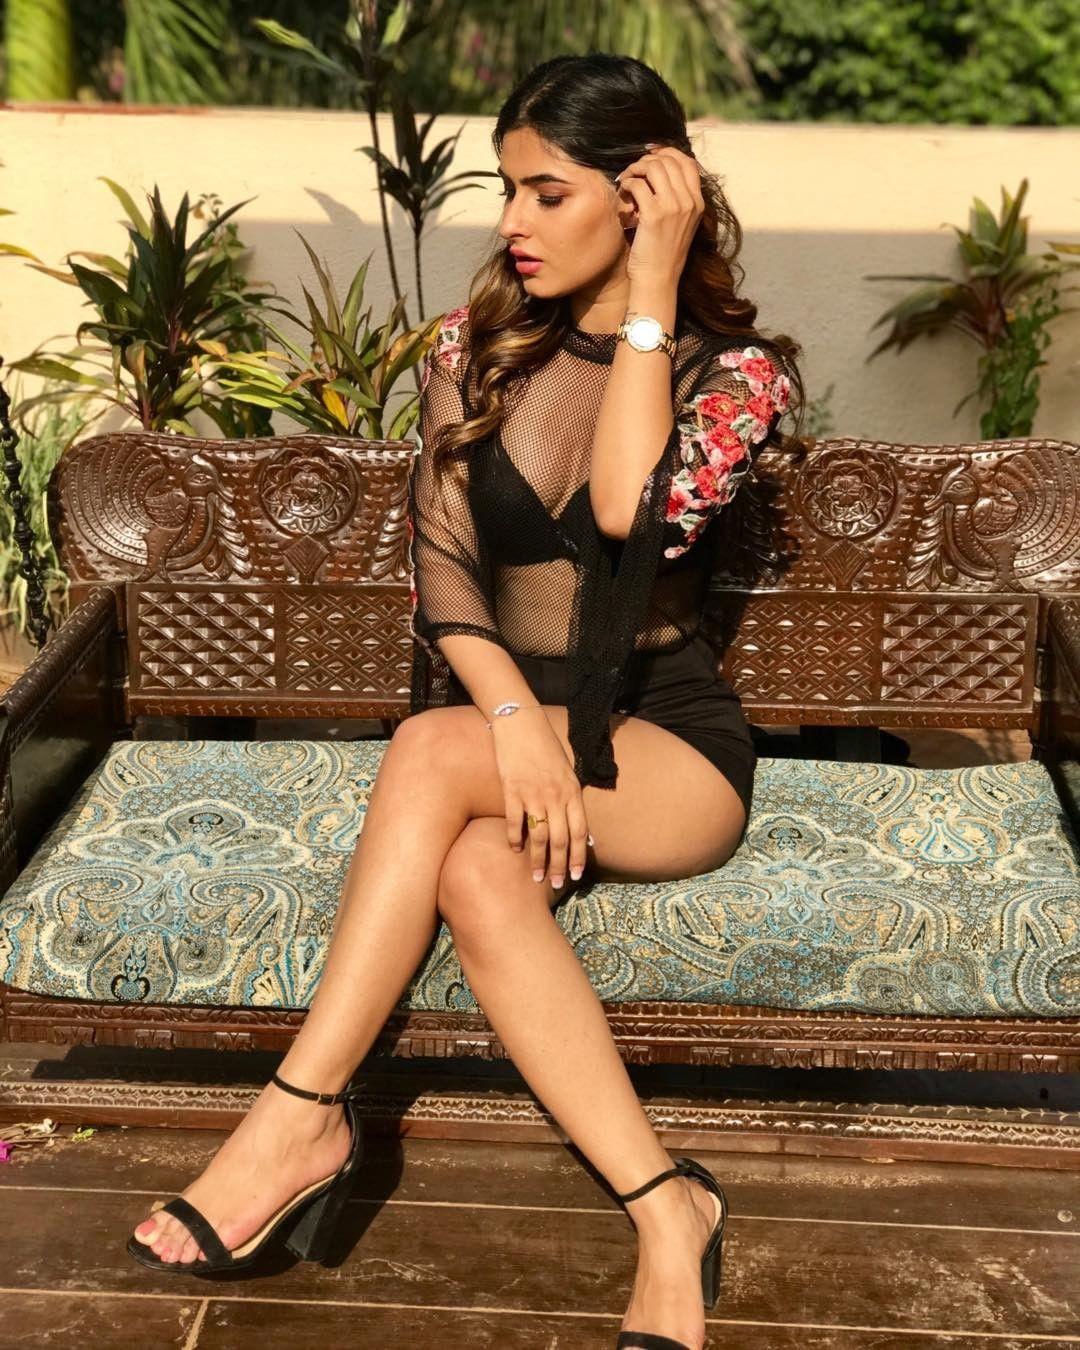 Karishma Sharma shown her sexy cleavage and thigh